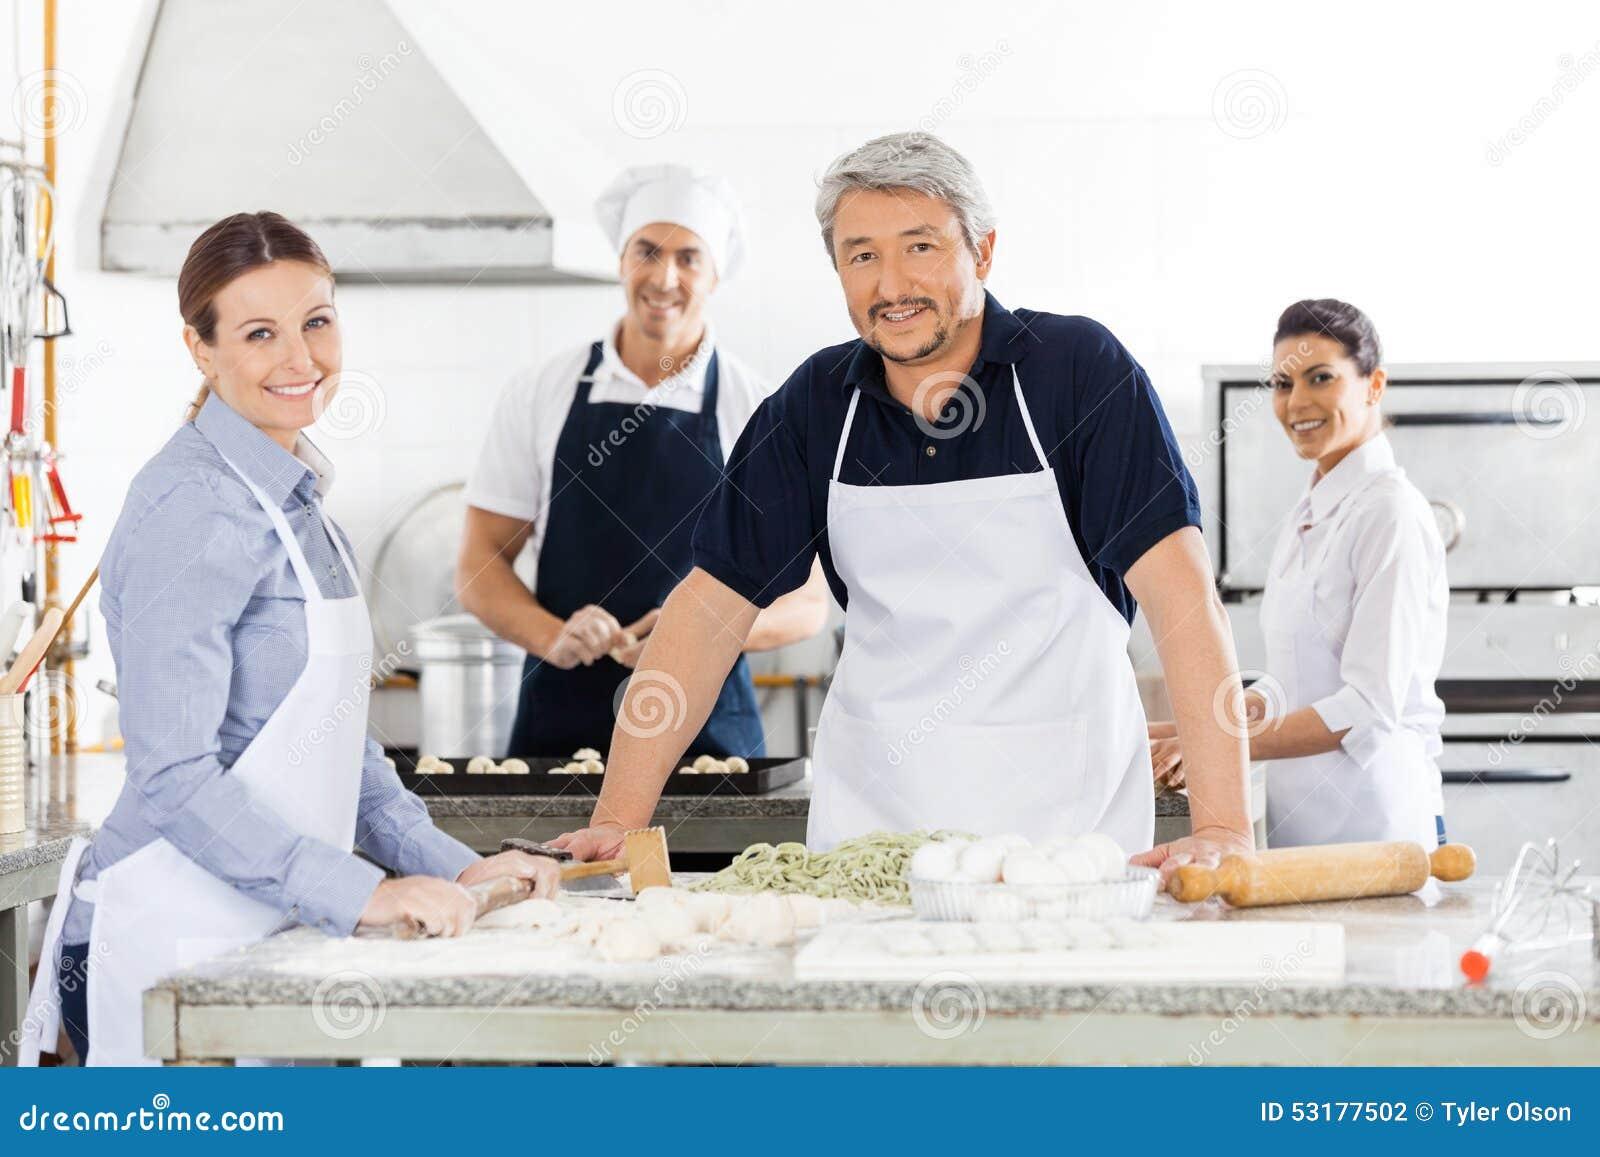 Confident Male And Female Chefs Preparing Pasta At